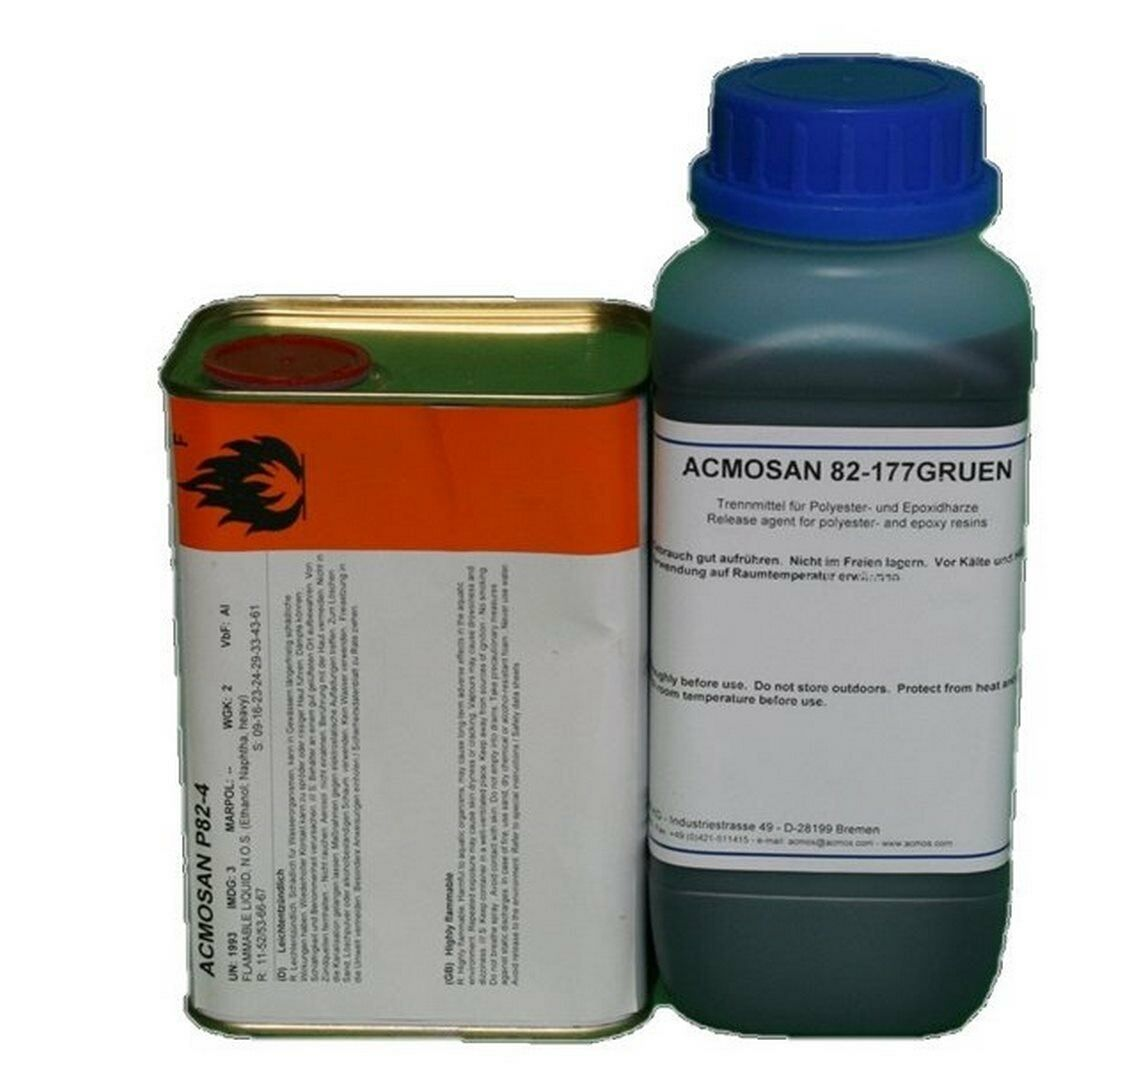 10 Epoxidharz kg Gelcoat dunkelblau ORTHO+200 ml Härter Polyesterharz Epoxidharz 10 Stiefelbau e8f4f9